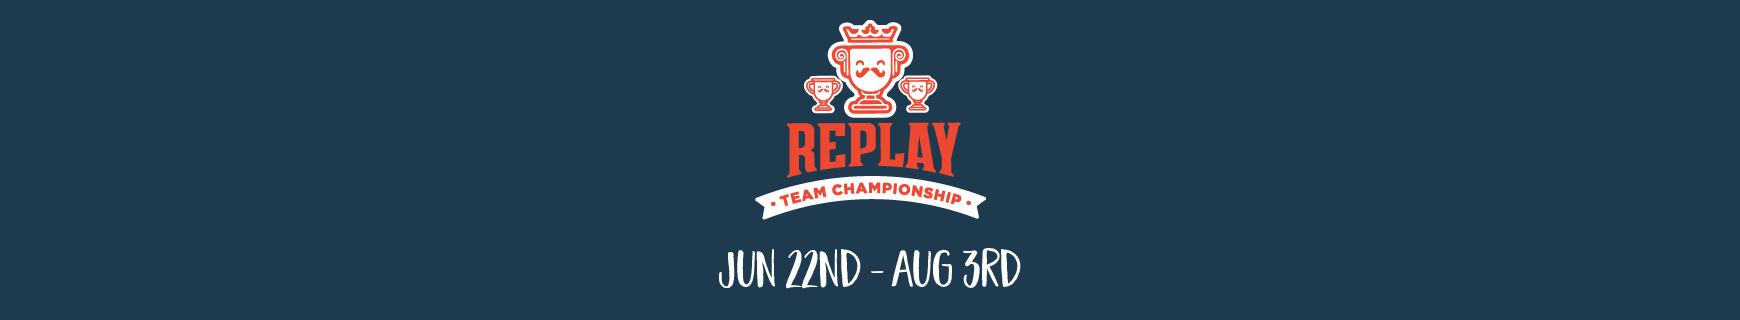 Team championship dates %28870 x 160%29 2x